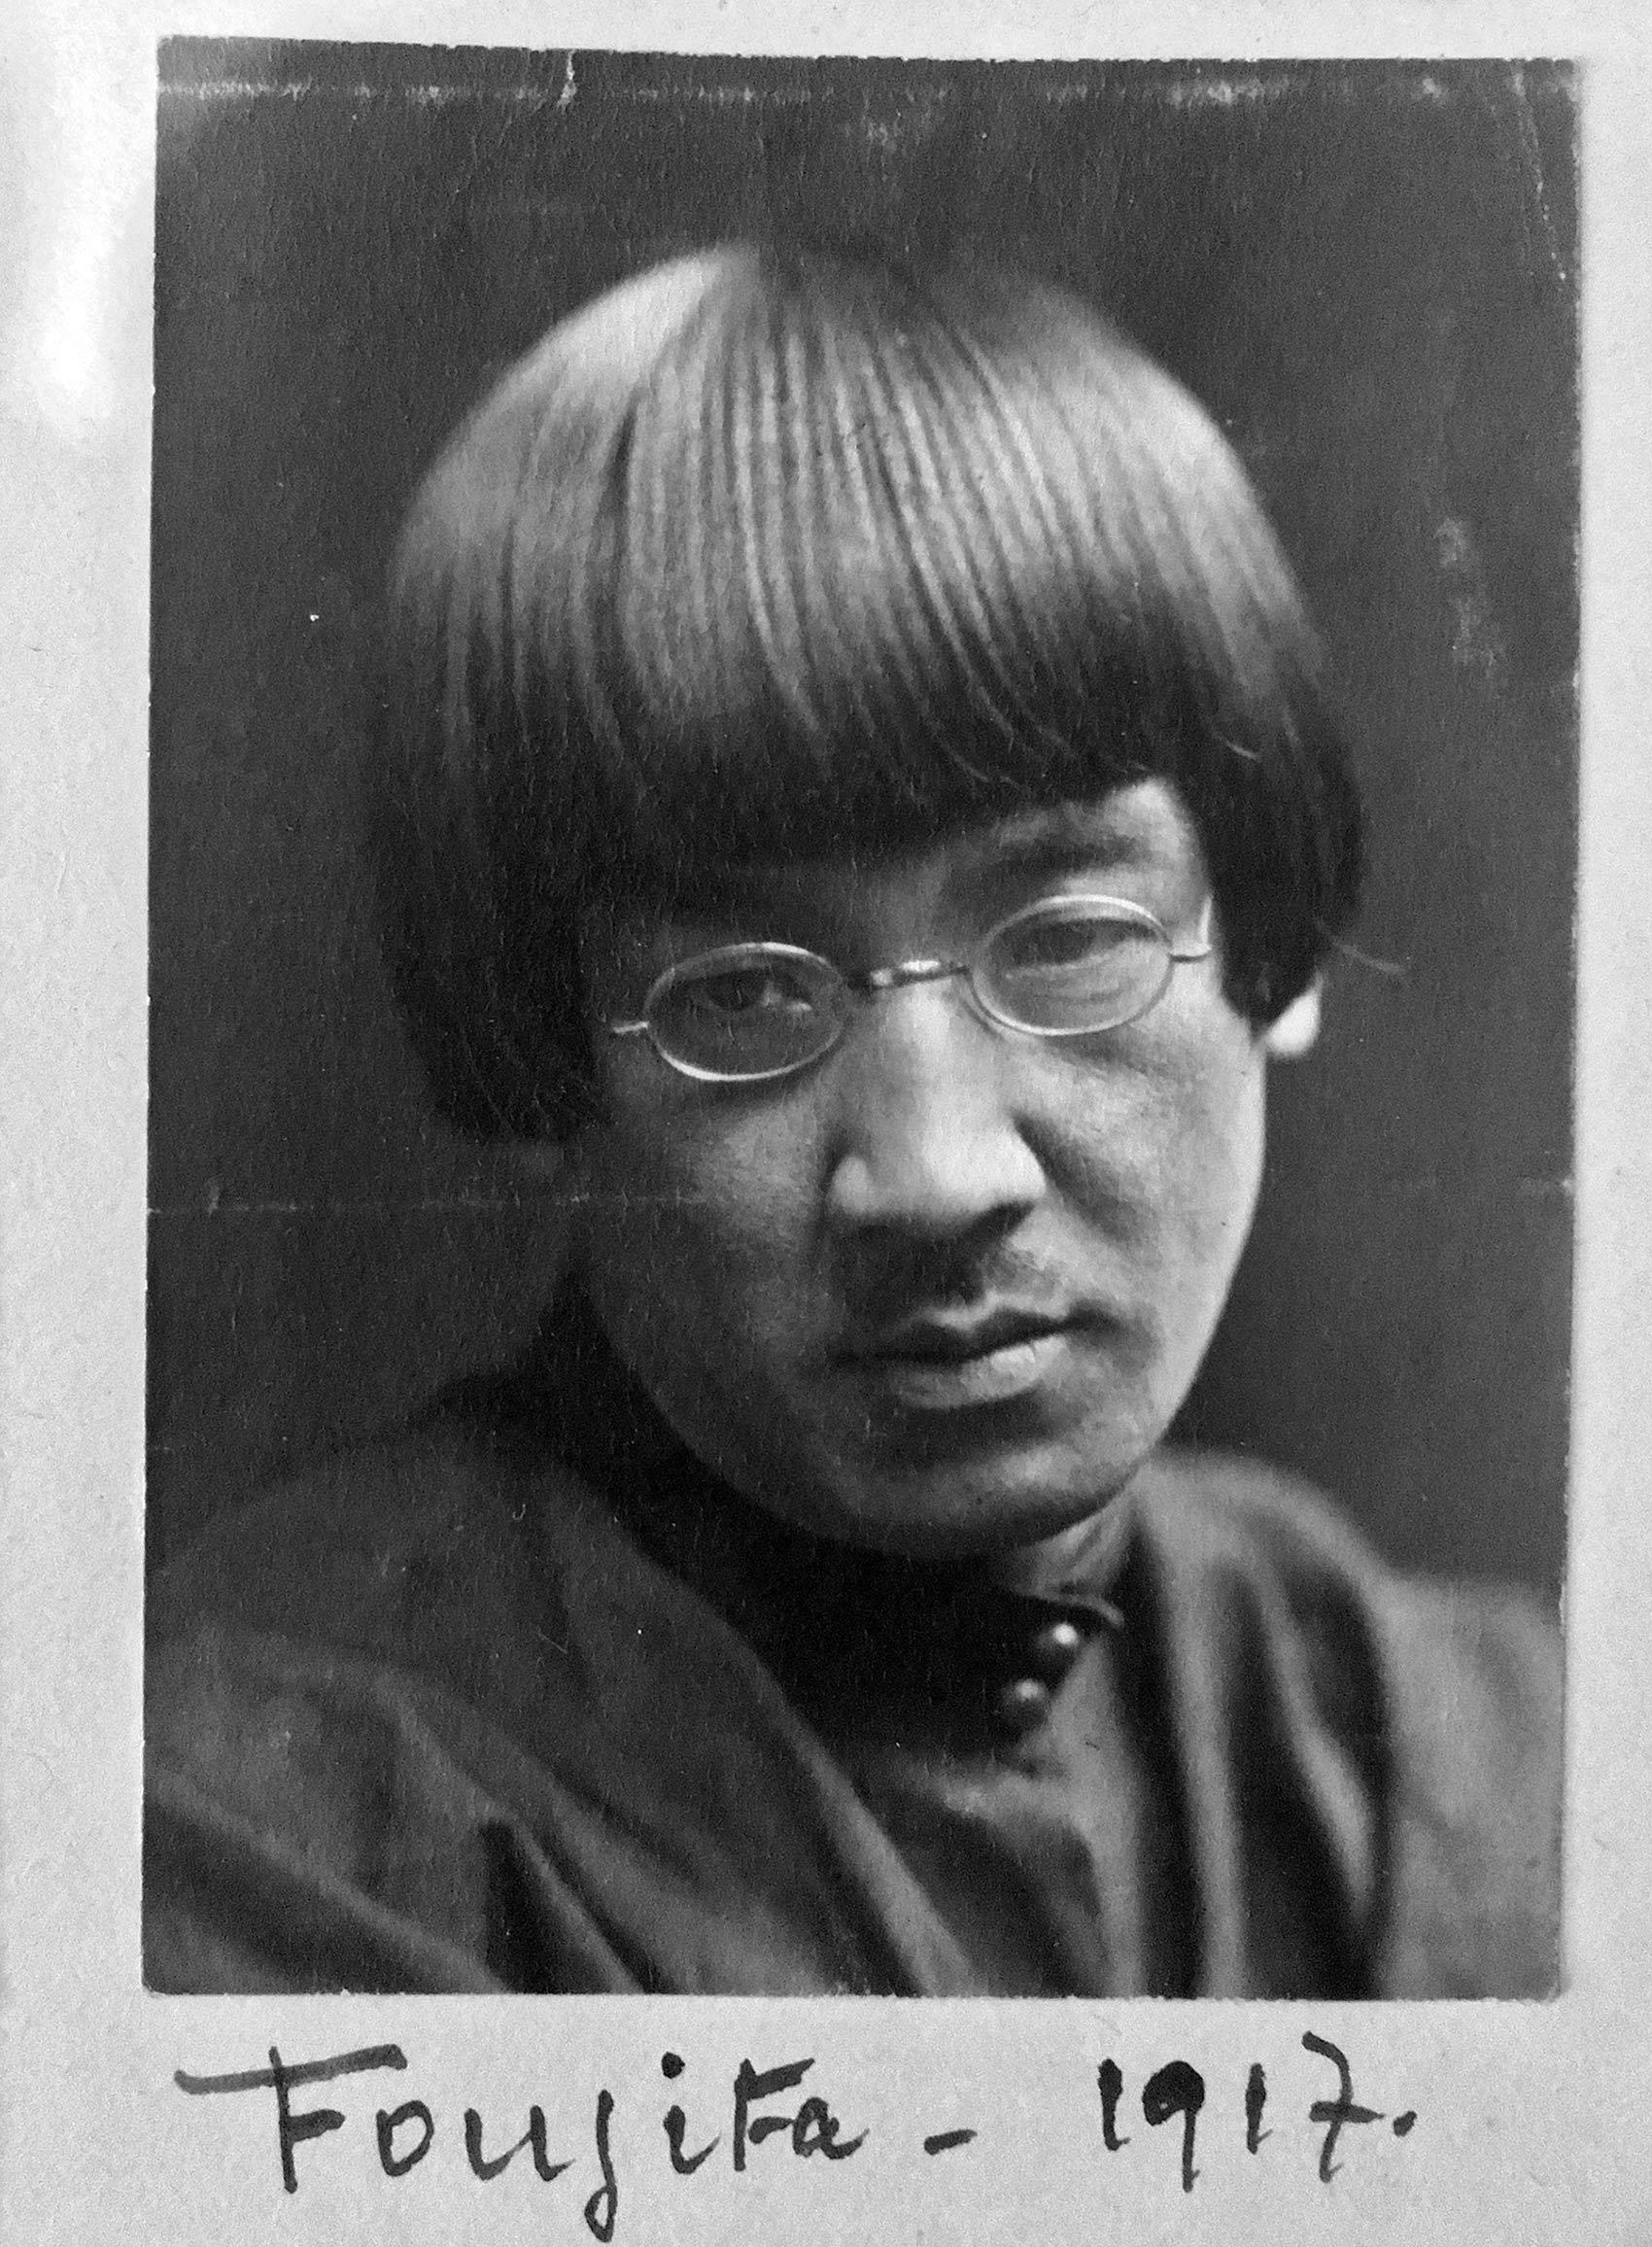 Portrait de Foujita, 1917